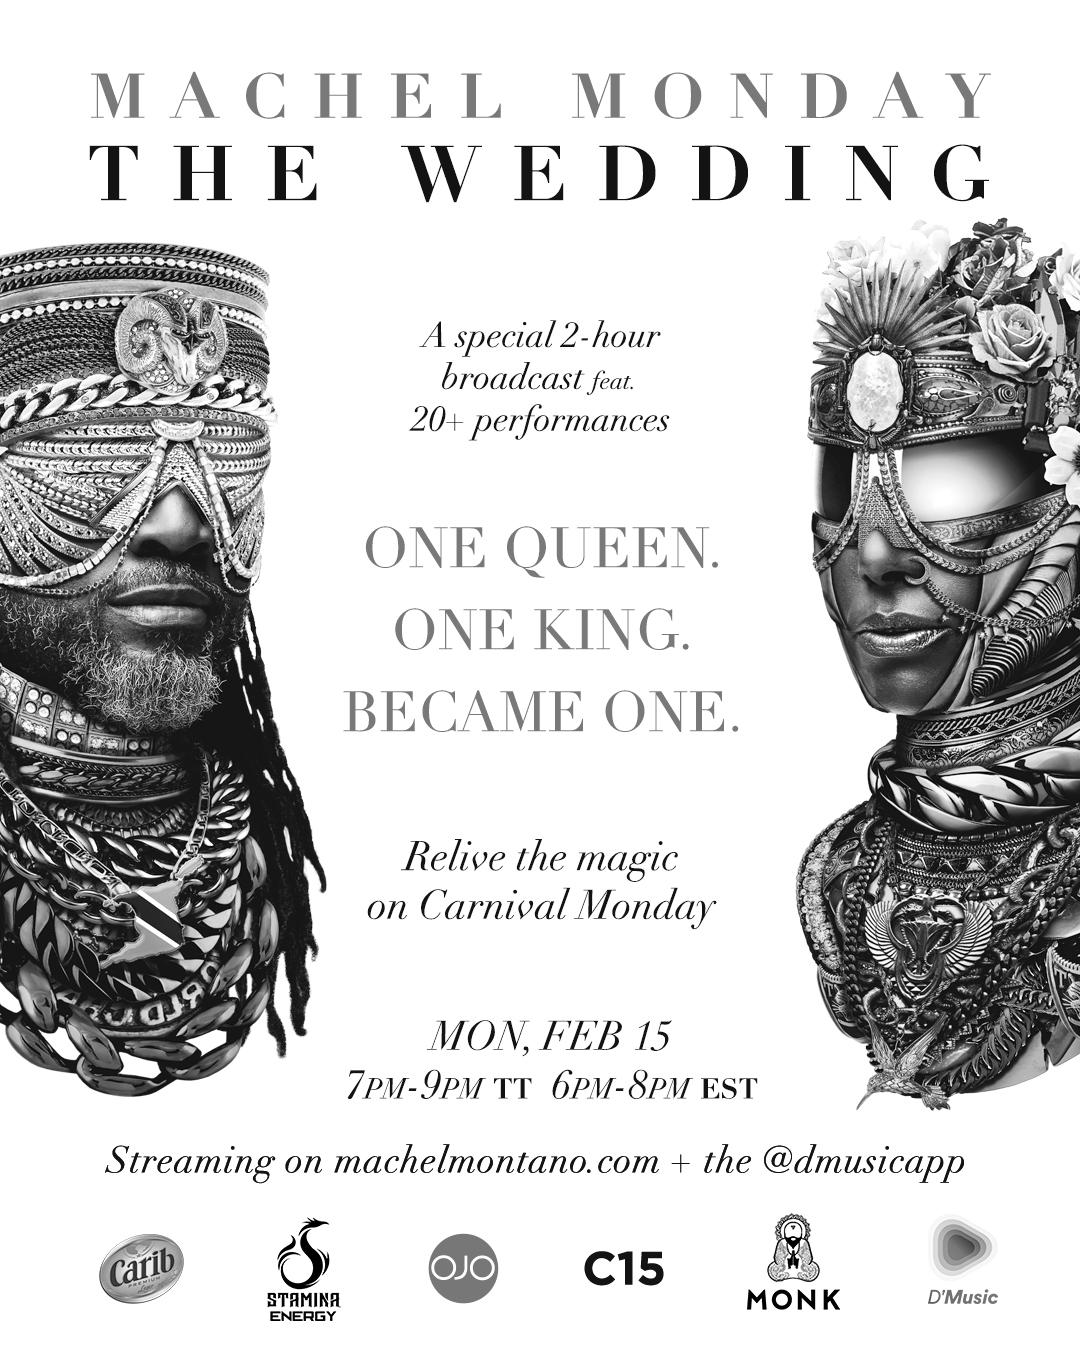 Machel Monday - The Wedding